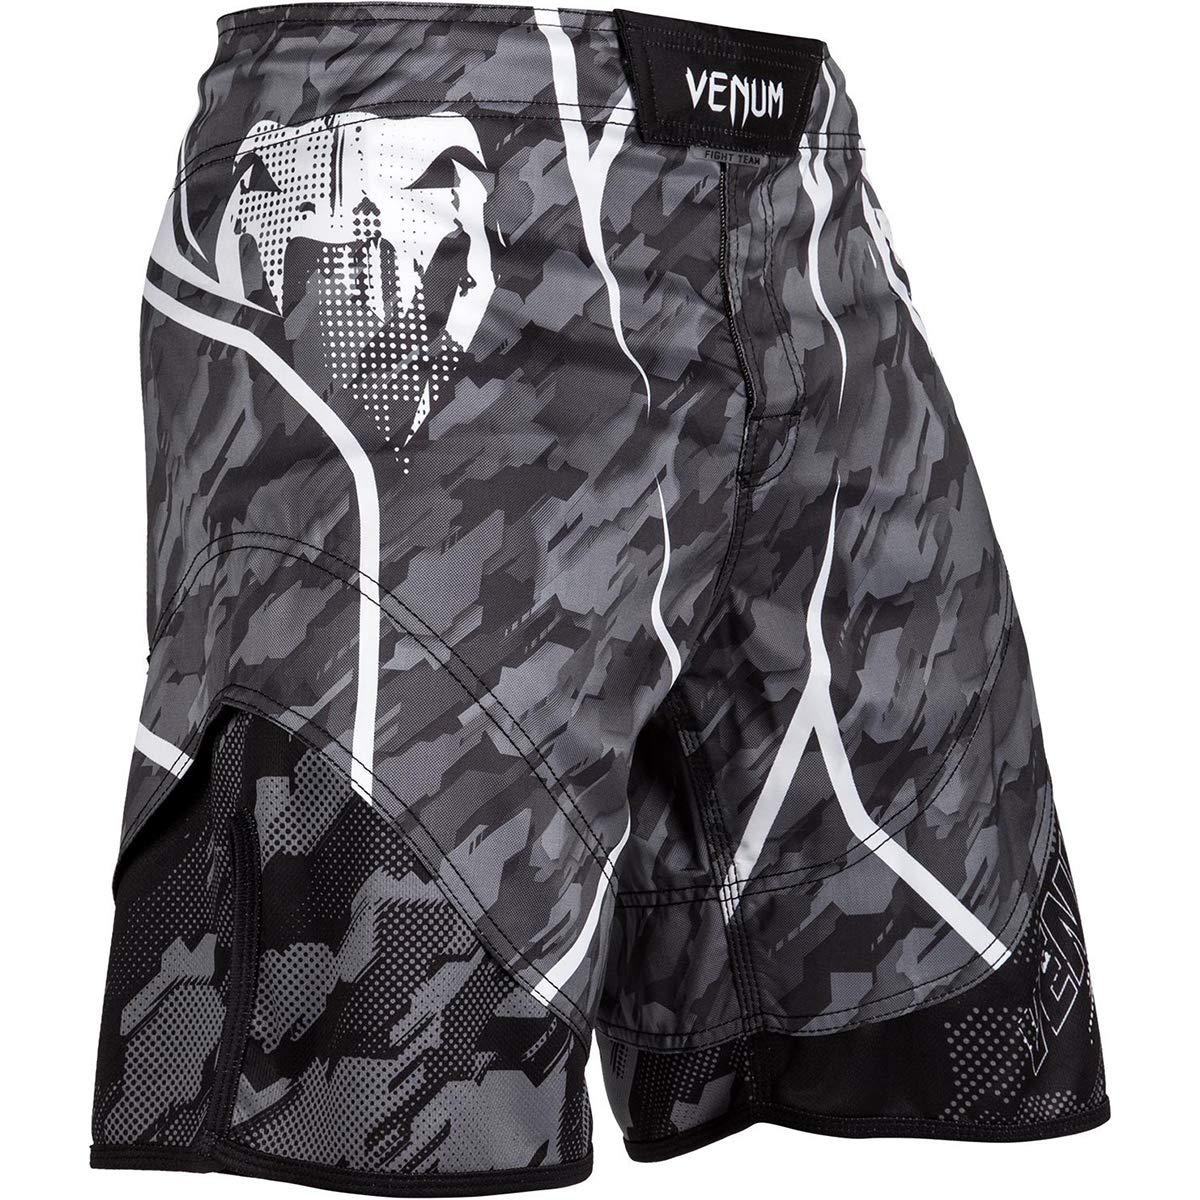 Venum Tecmo Lightweight MMA Fight Shorts - XS - Dark Gray by Venum